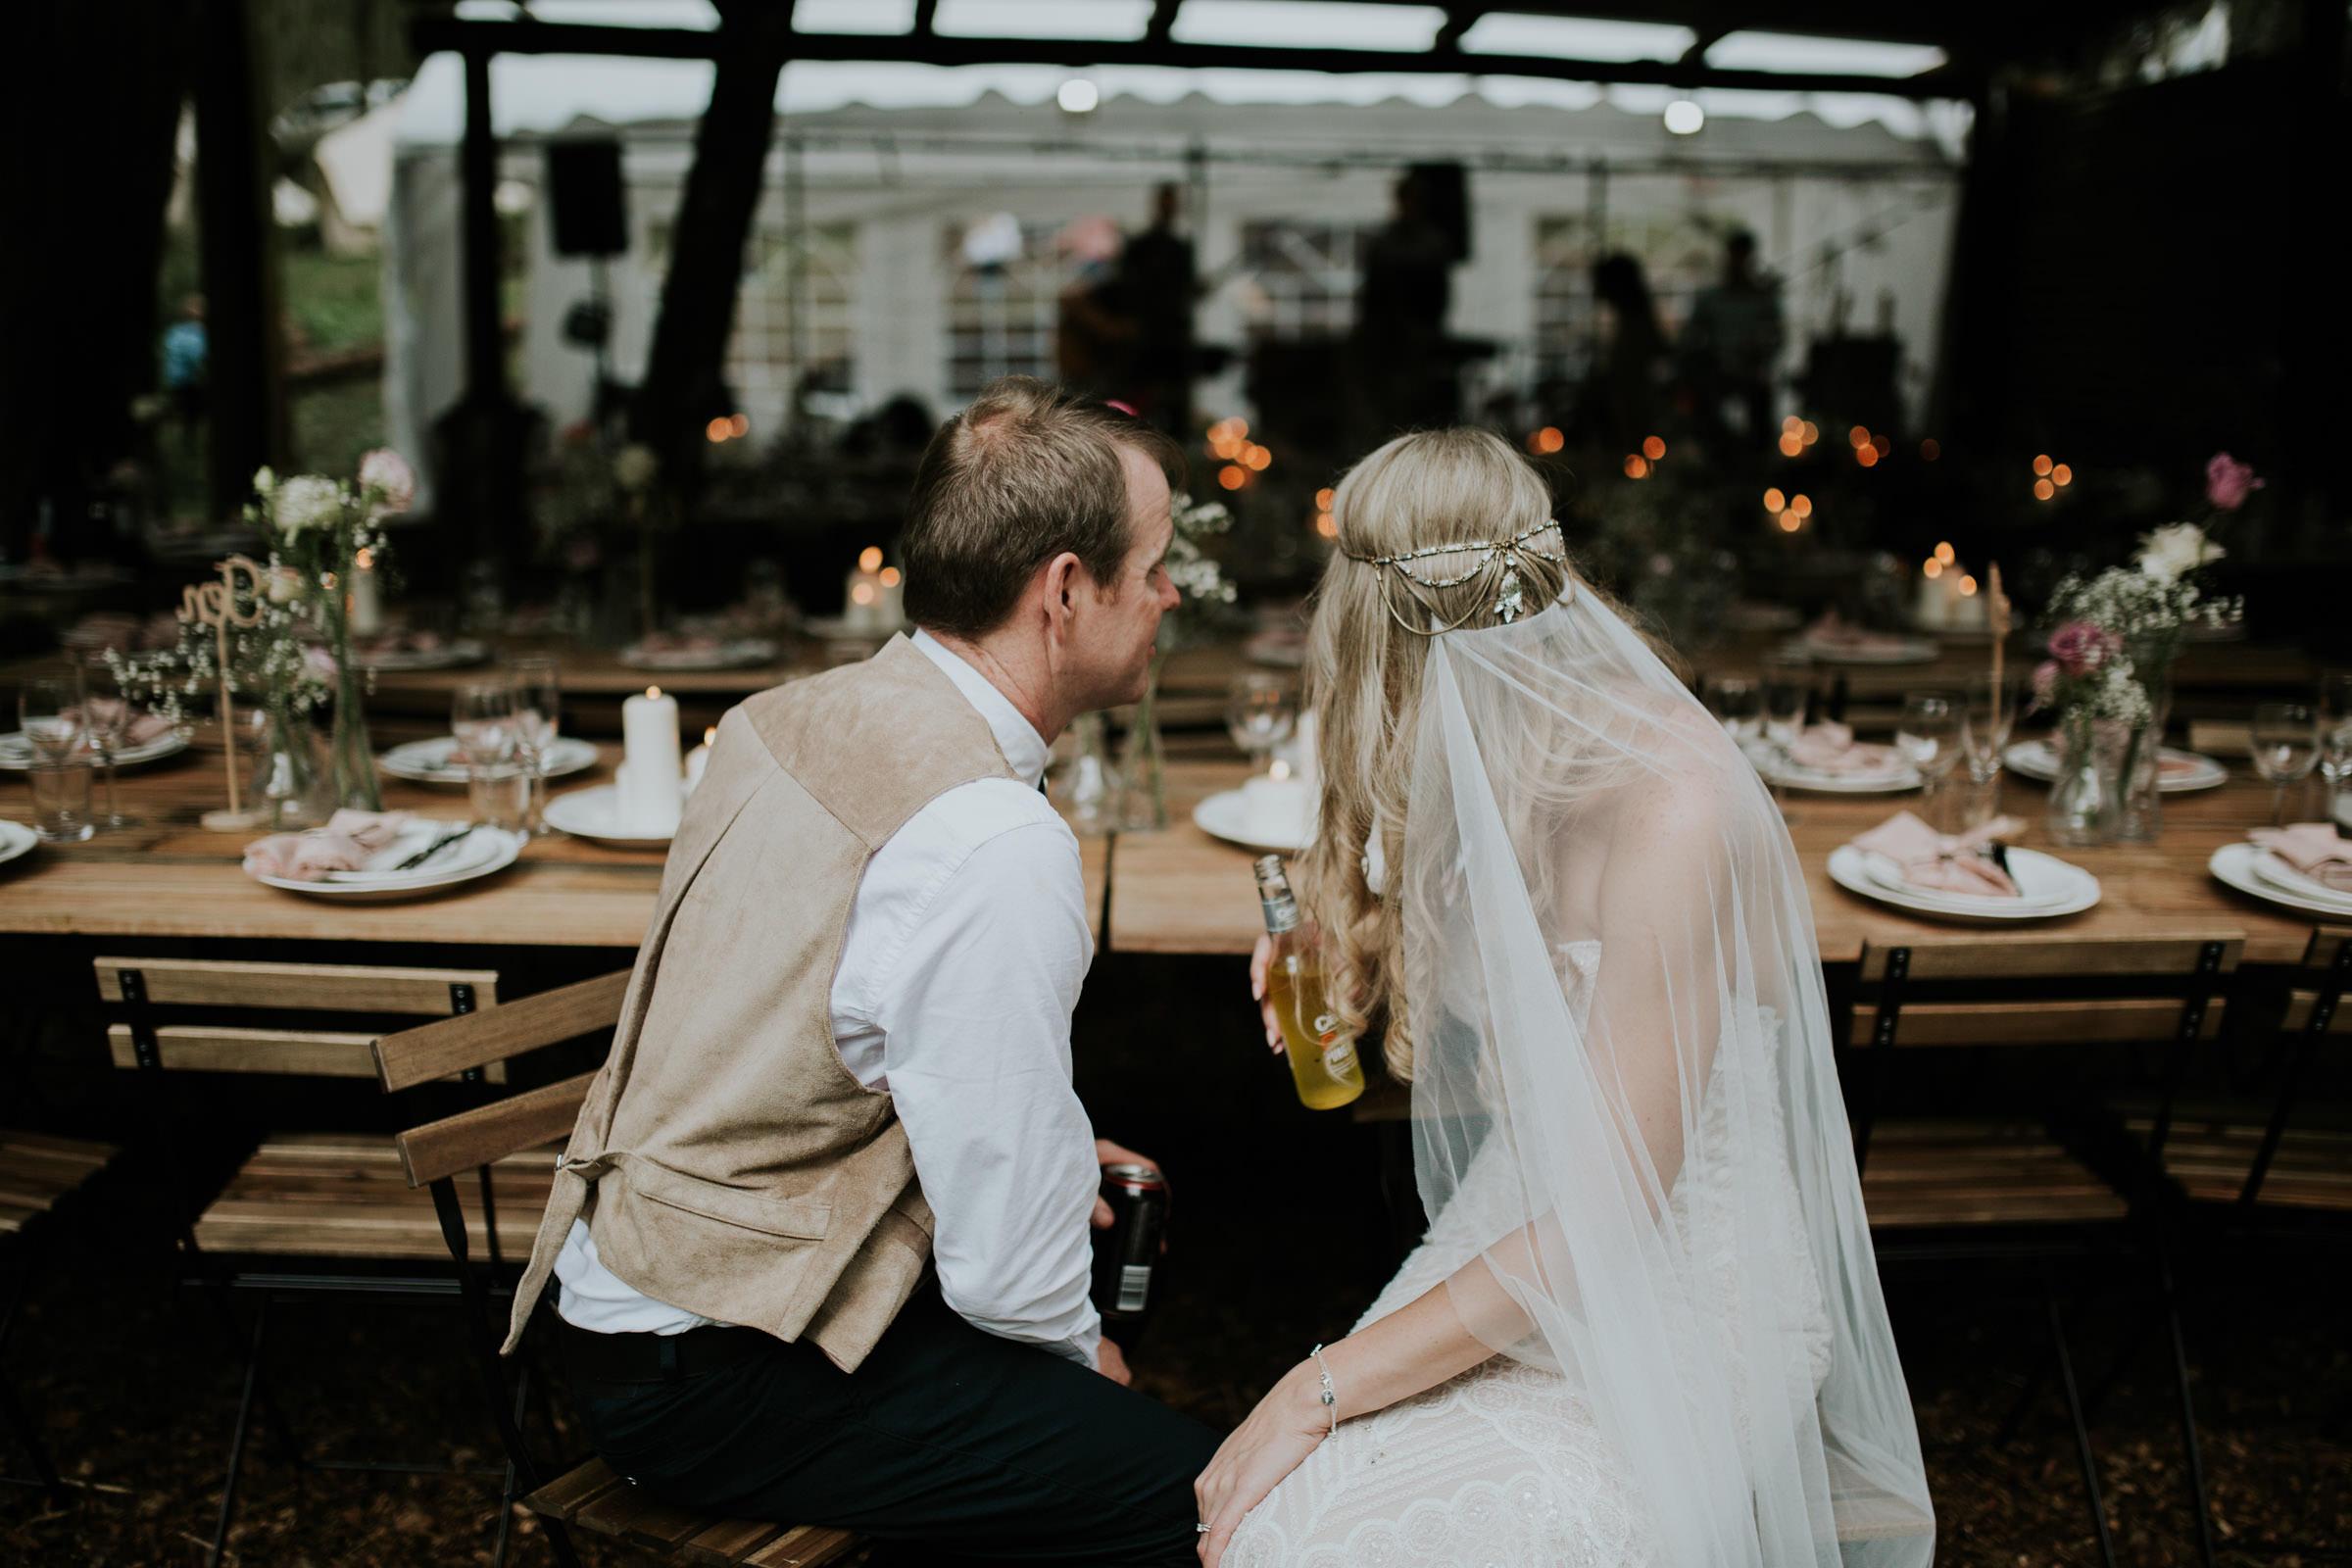 Emma+John+Far+South+Coast+Wedding+Festivl+Glamping+Bush-142.jpg